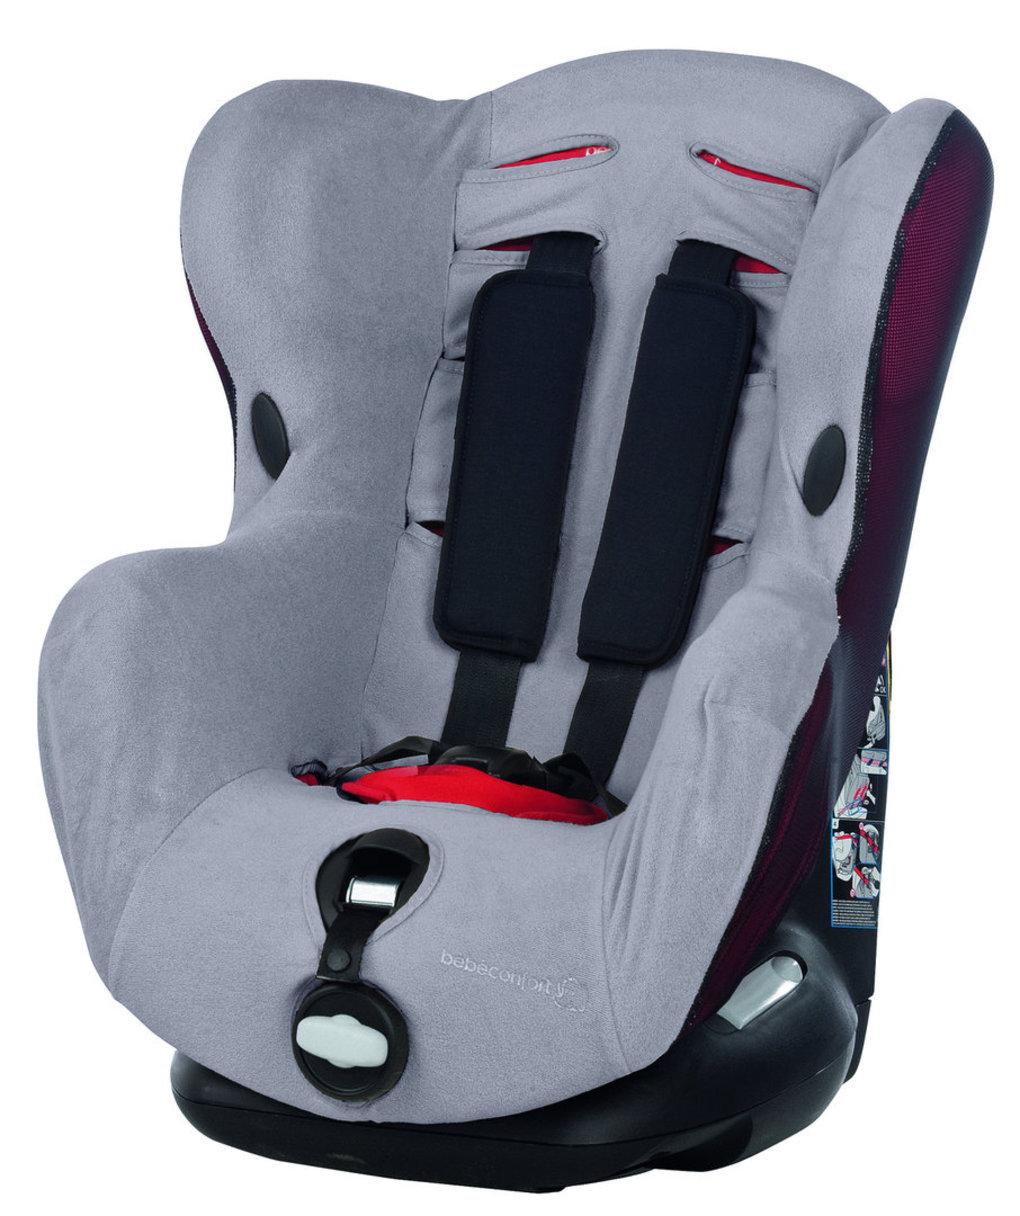 Real Baby Κάλυμμα Καθίσματος Grigio Chia Iseos - Γκρι